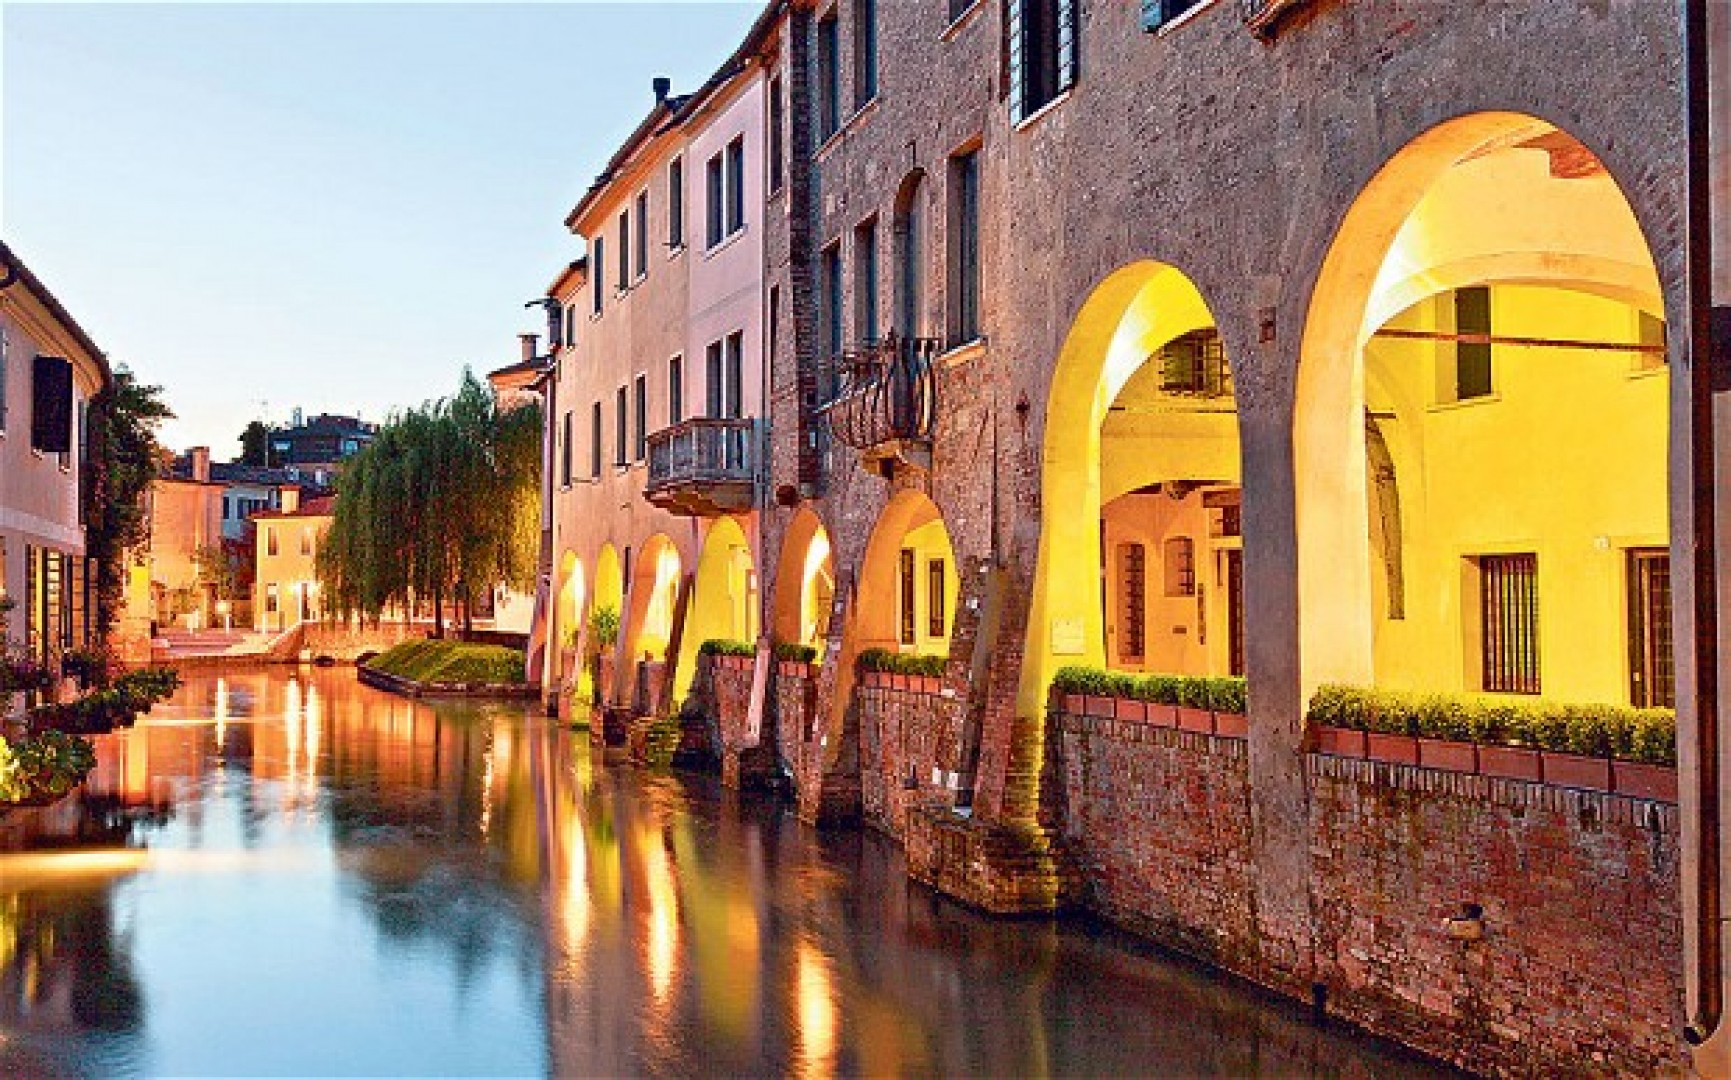 NCC Treviso